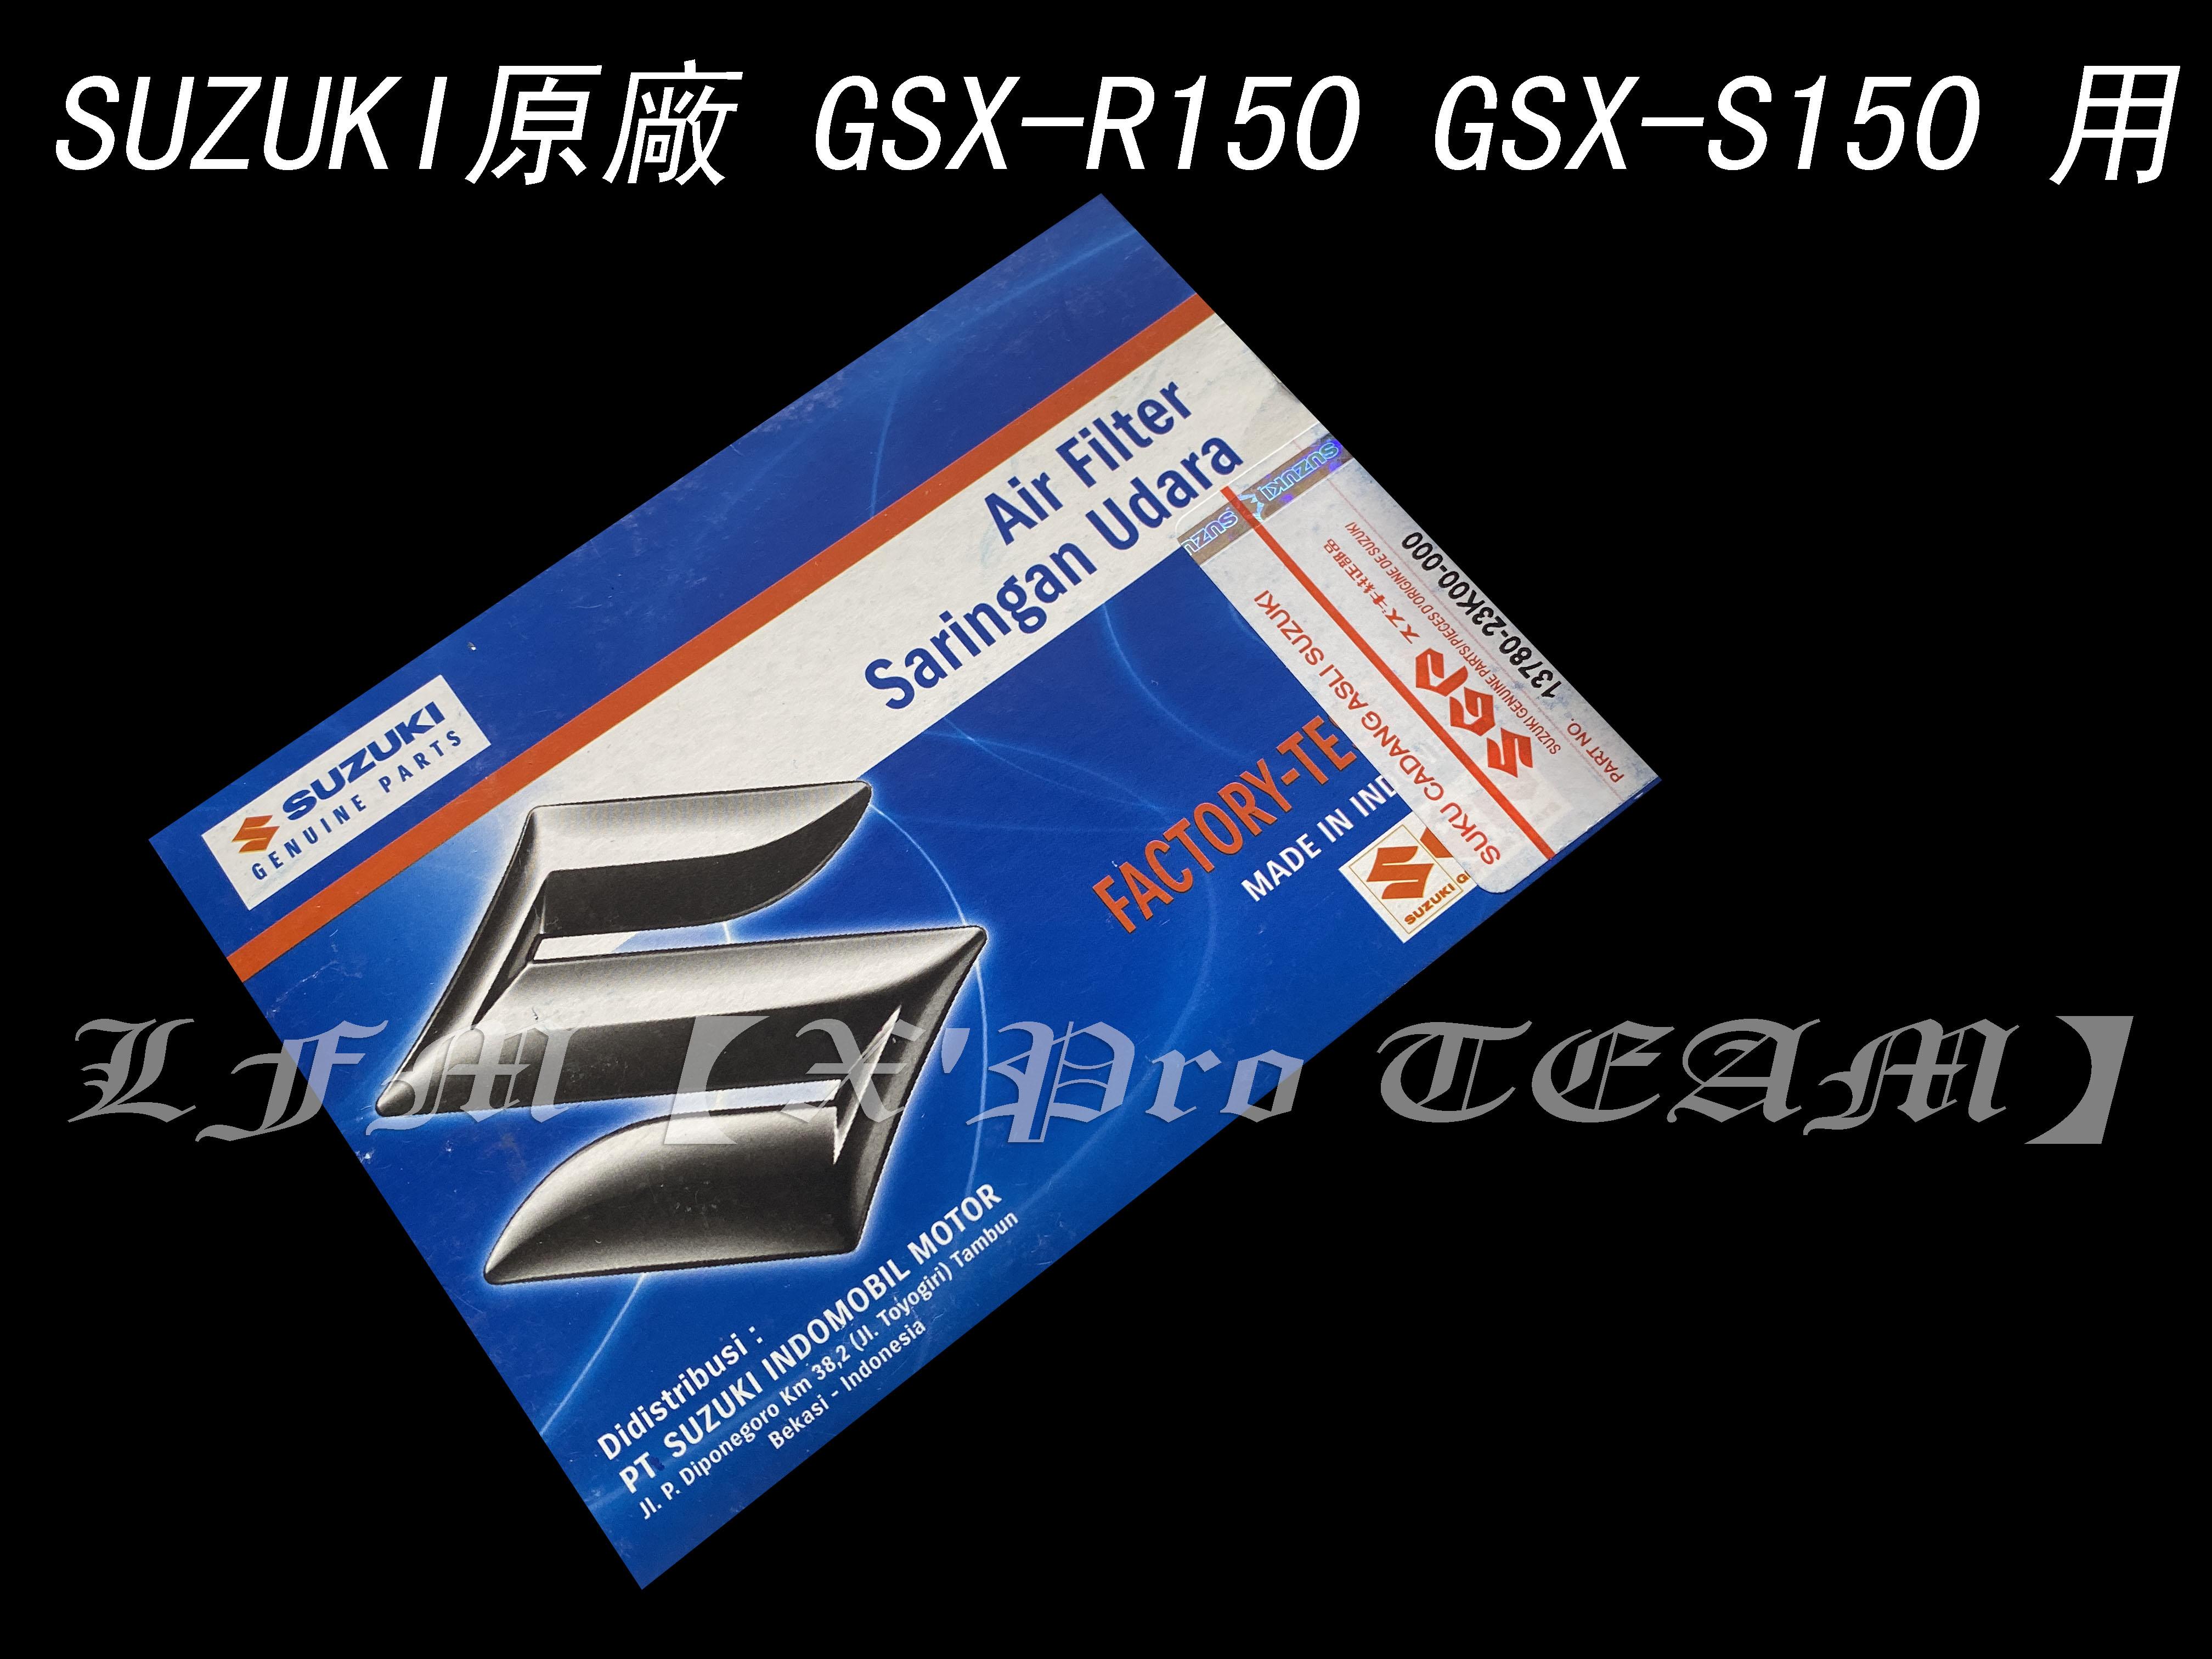 【LFM】GSX-R150 GSX-S150 小阿魯 原廠 空濾 空氣濾清器 空濾芯 SUZUKI 0